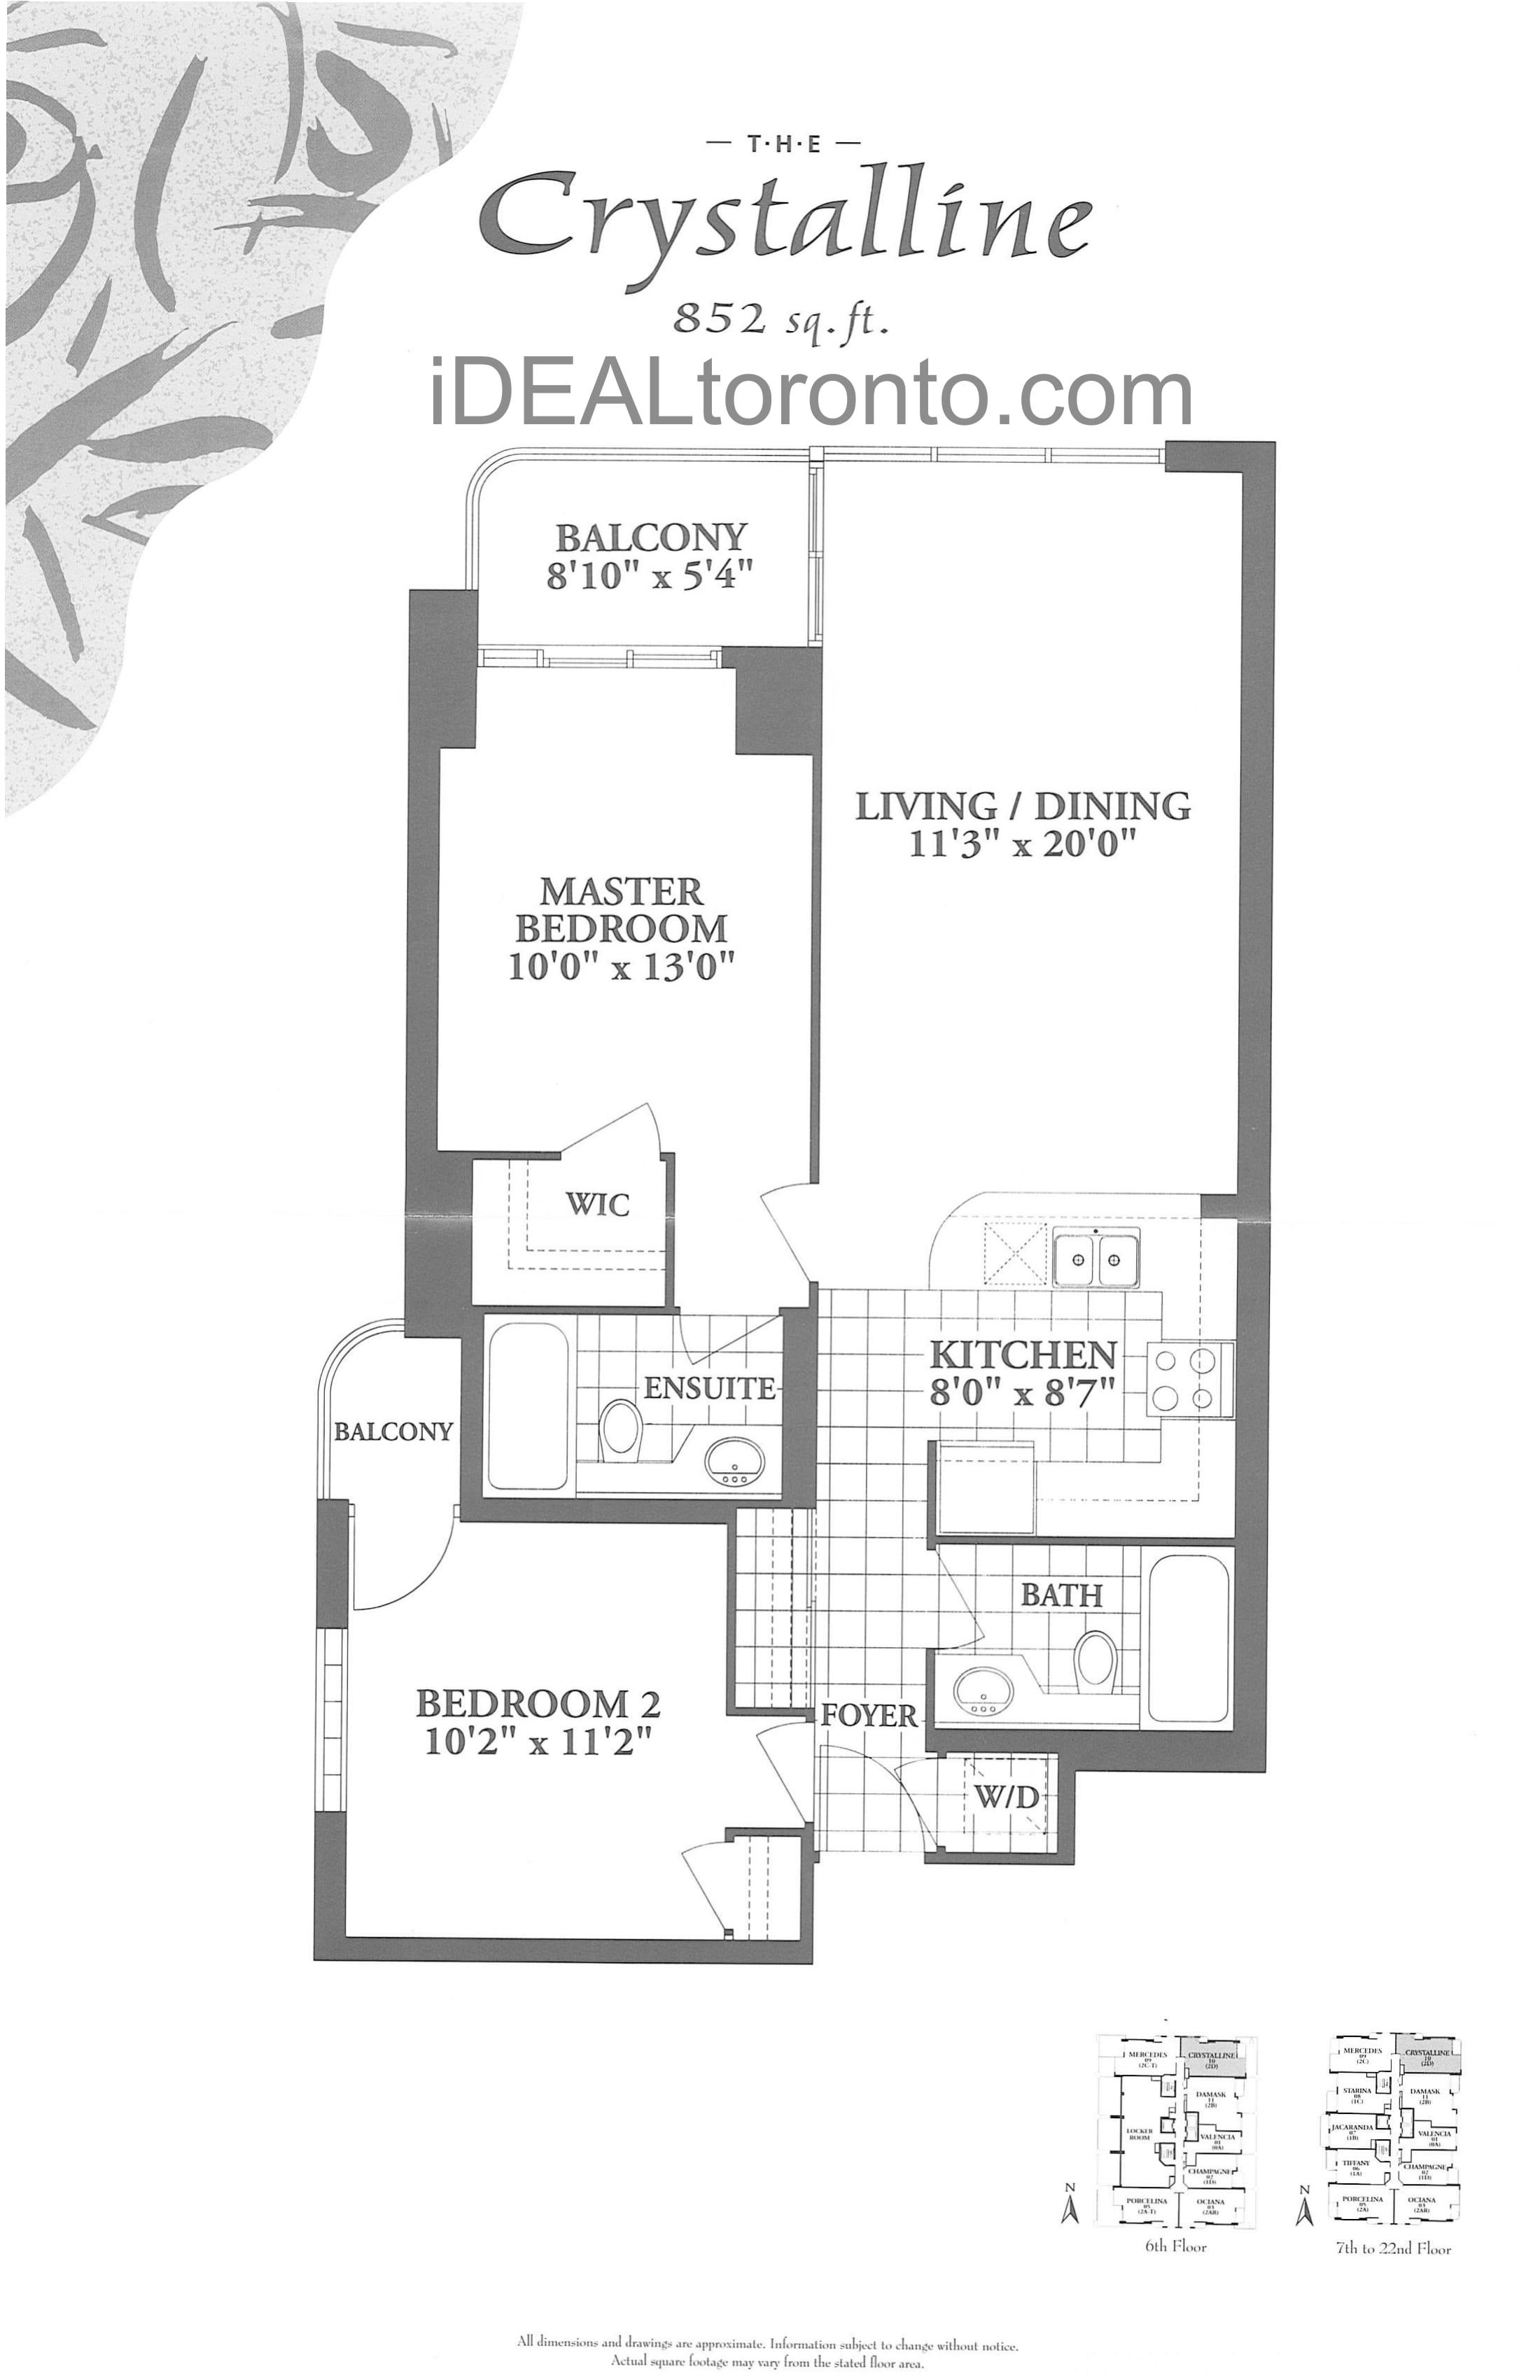 The Crystalline: 2 Bedroom, 852 SqFt